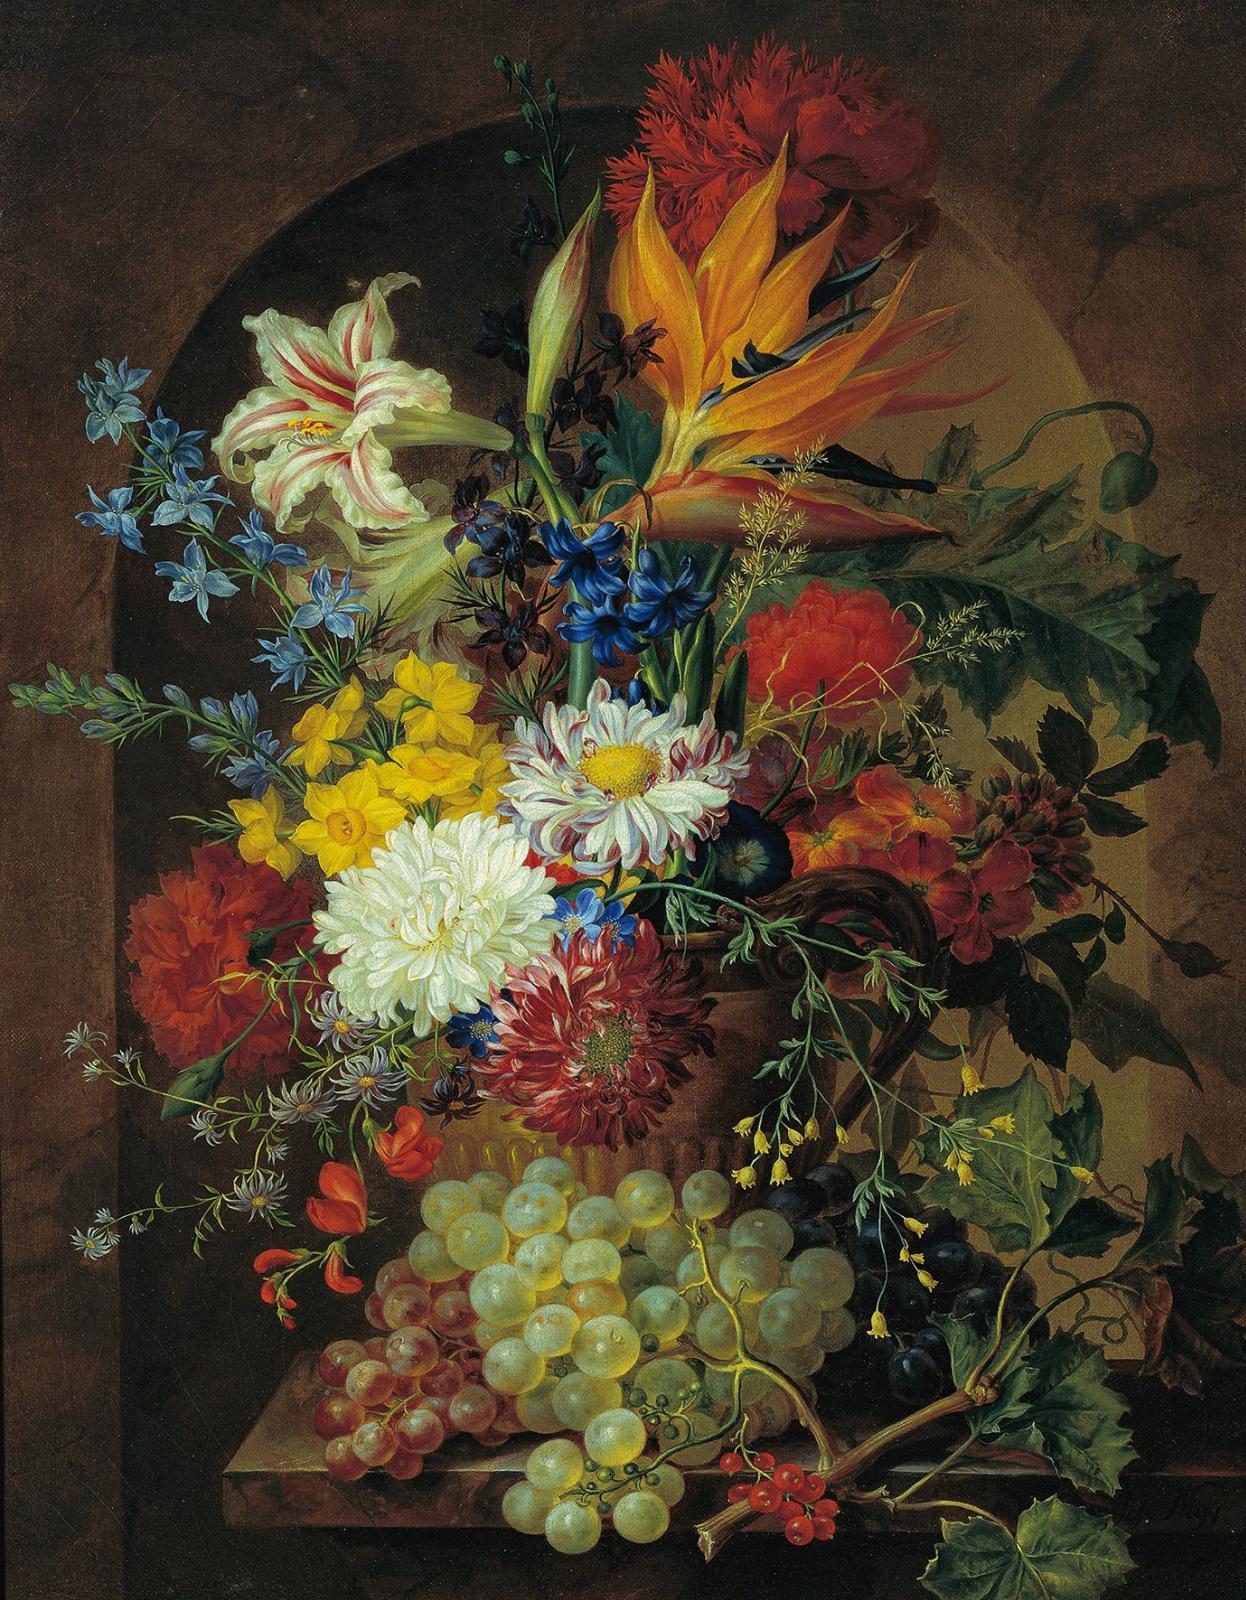 Йозеф Нигг. Цветочный натюрморт